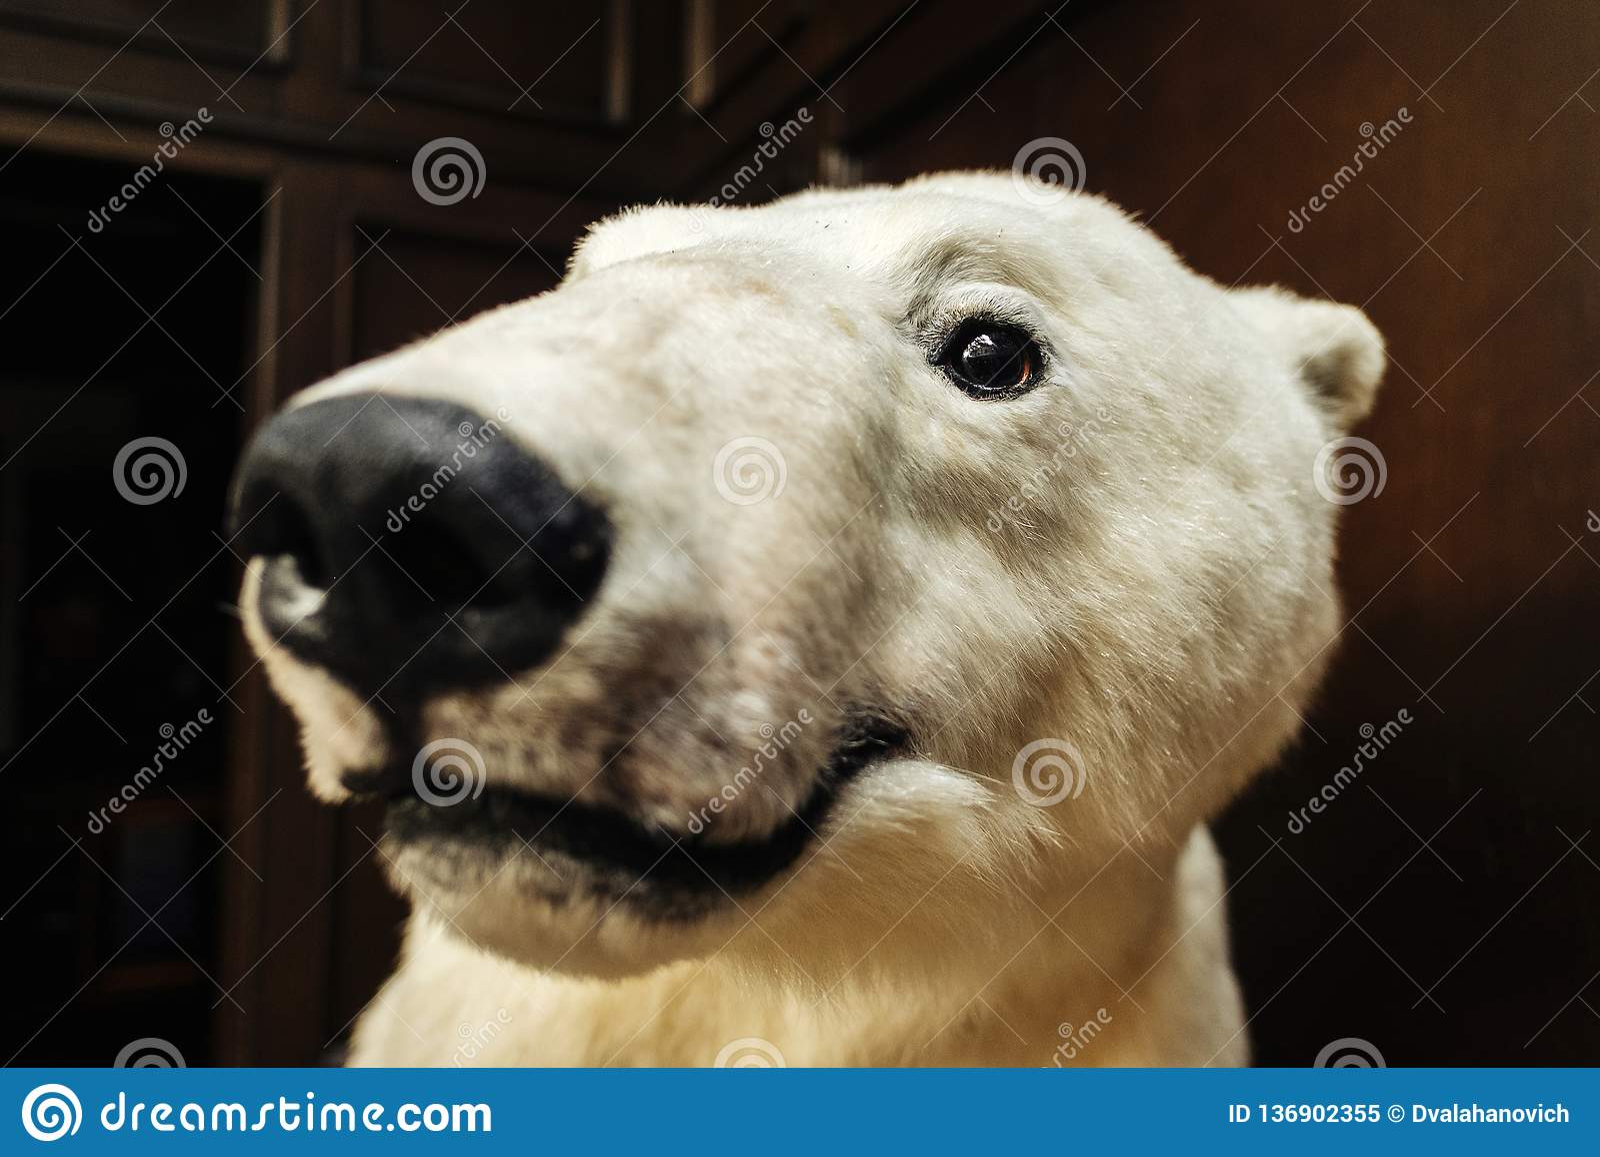 Big white bear looks at camera